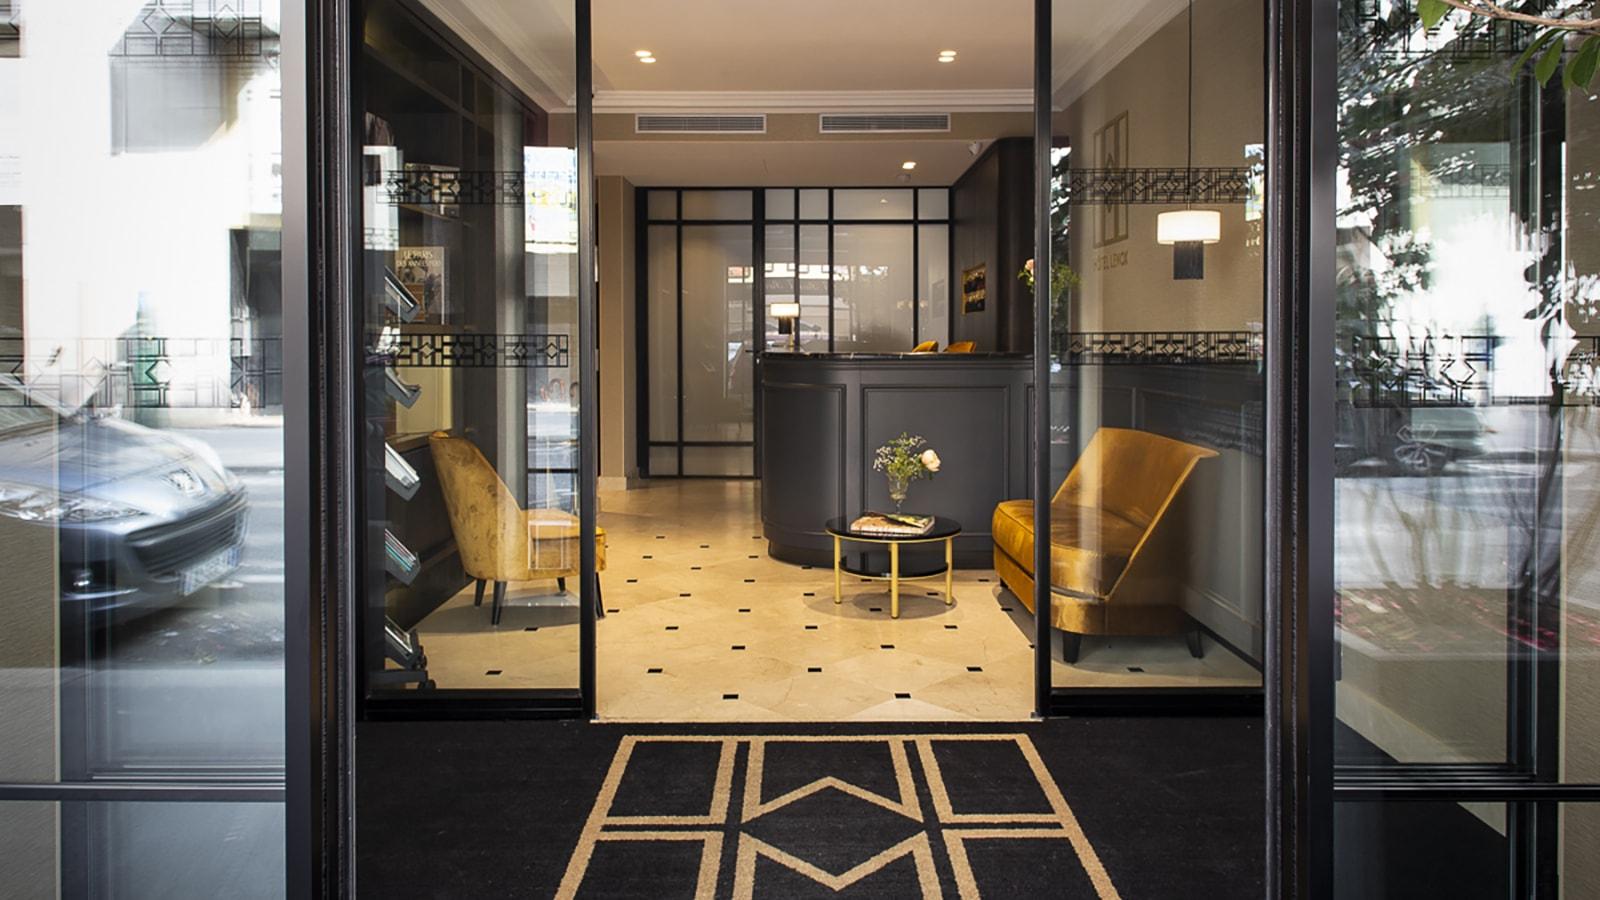 EFI Design Hotel Lenox Paris Efi Design (11) 1165